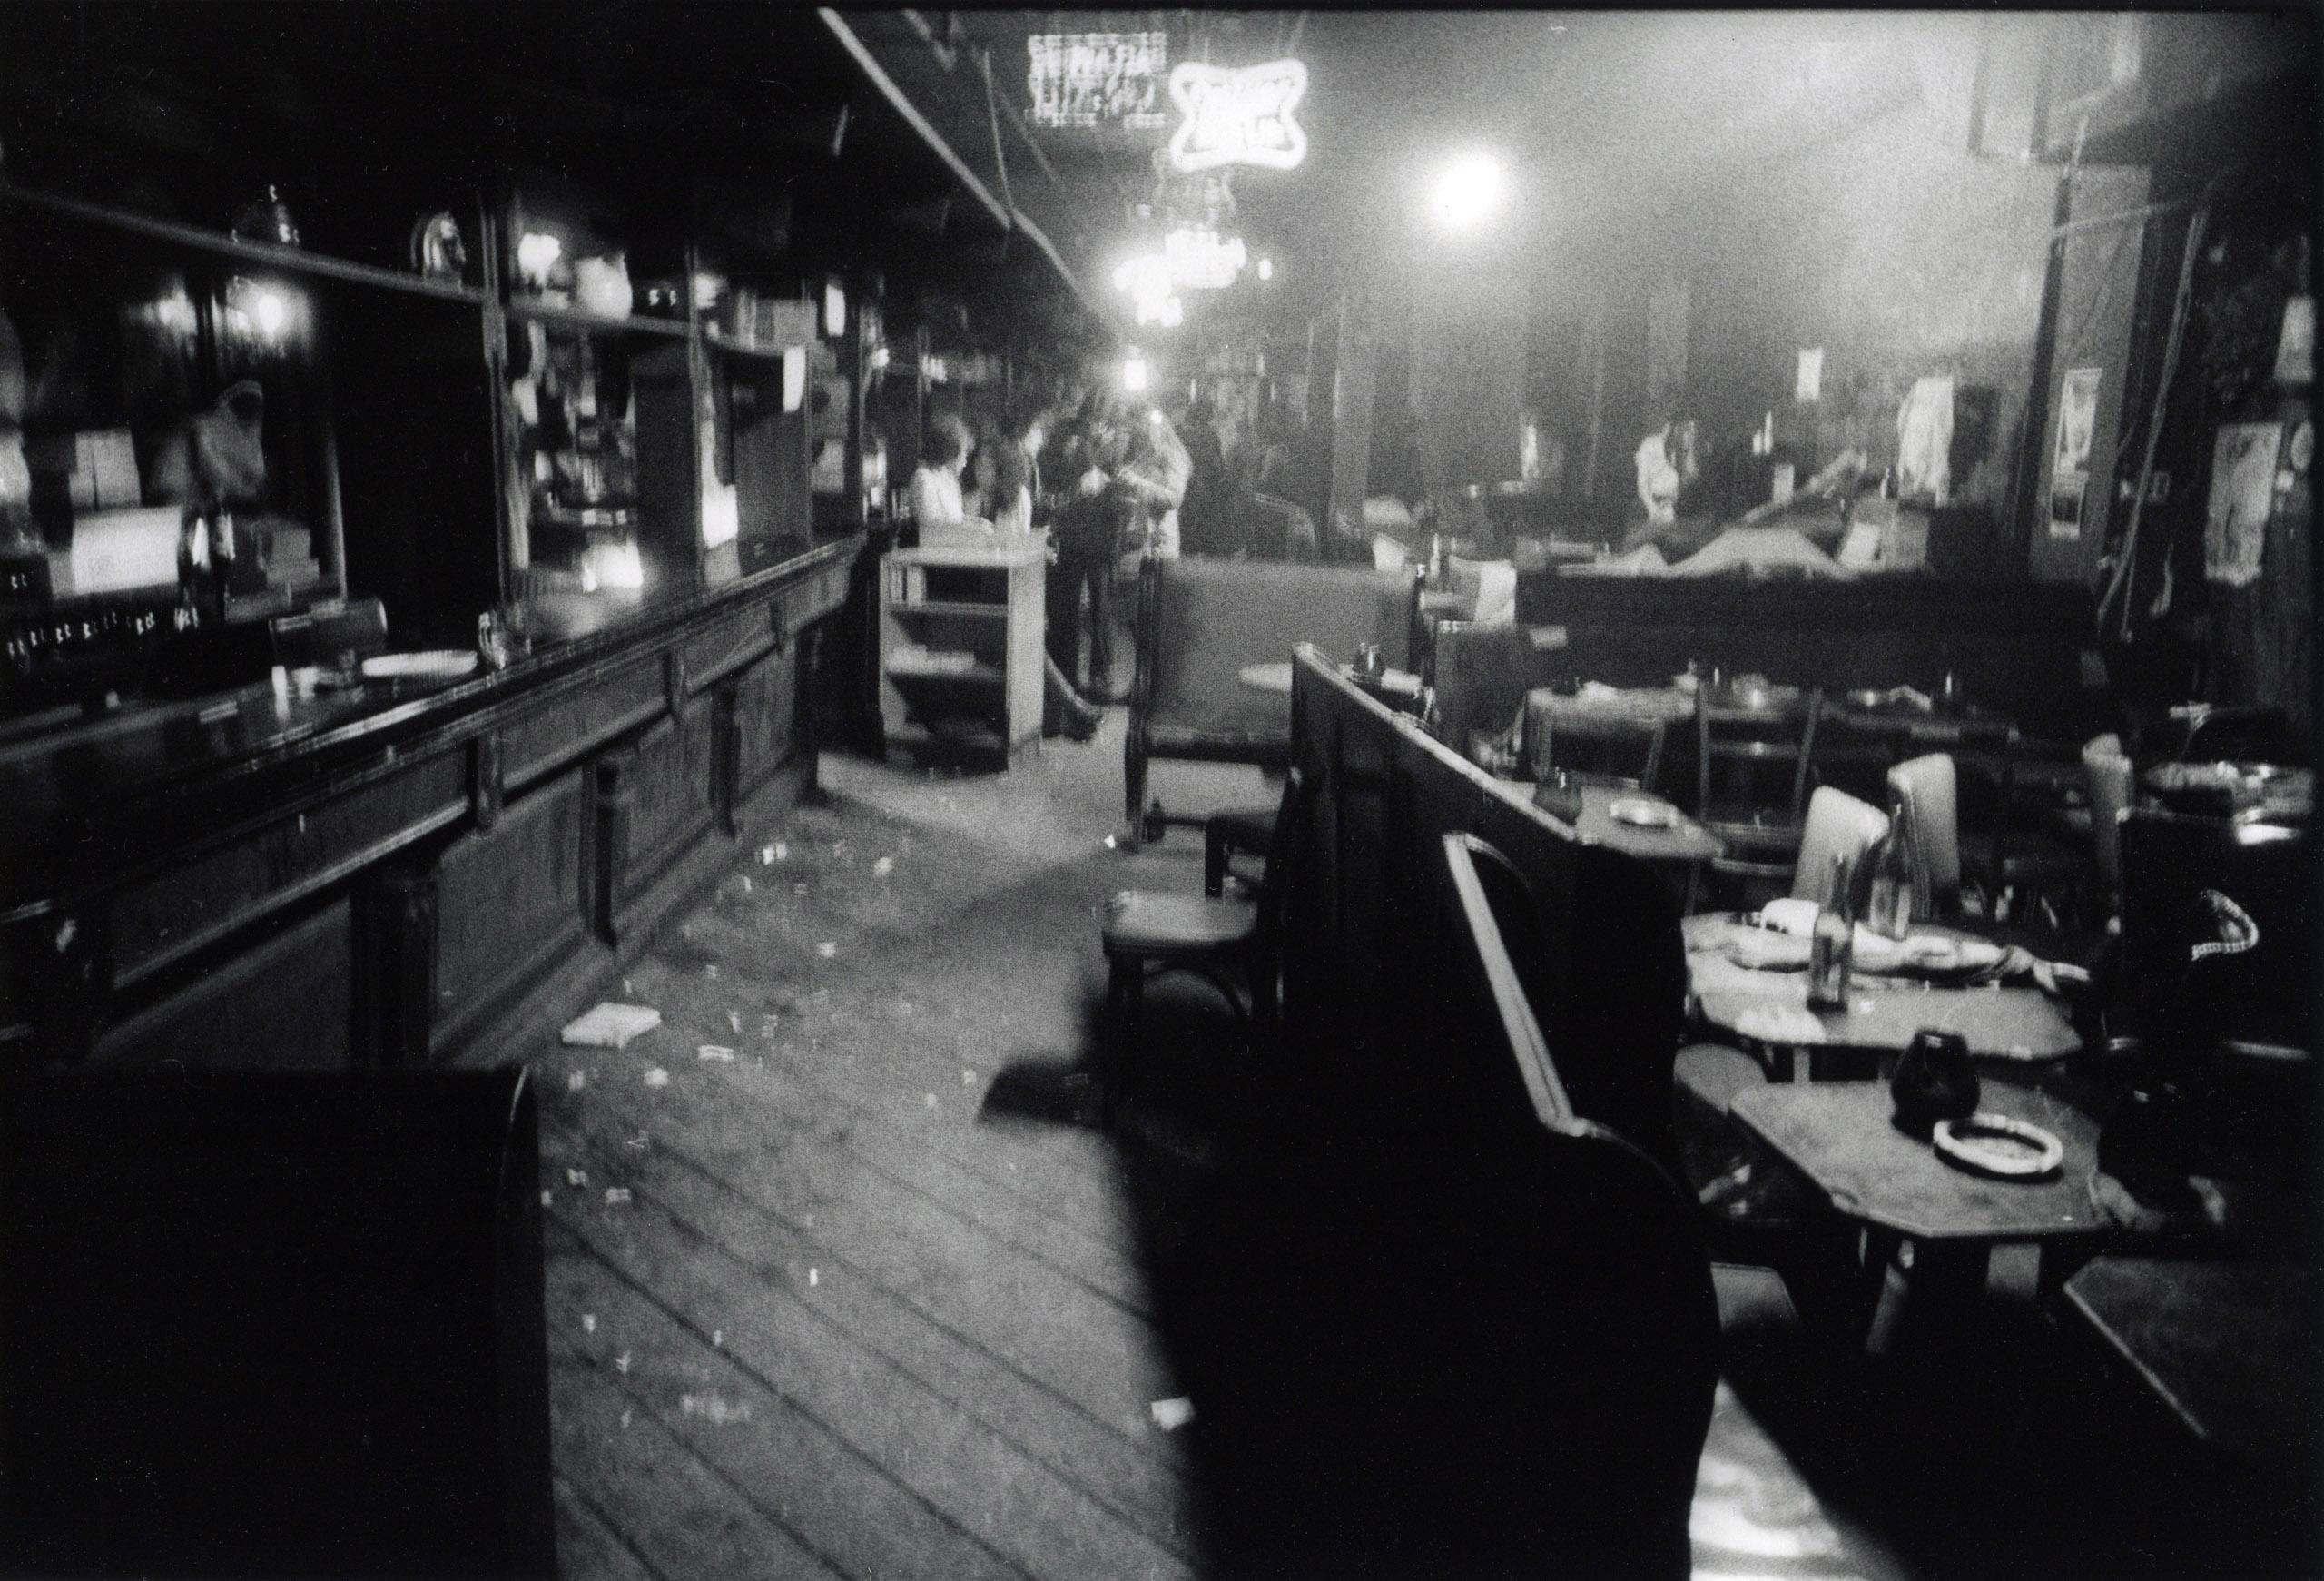 CBGB interior at closing time, 4am, 1977.